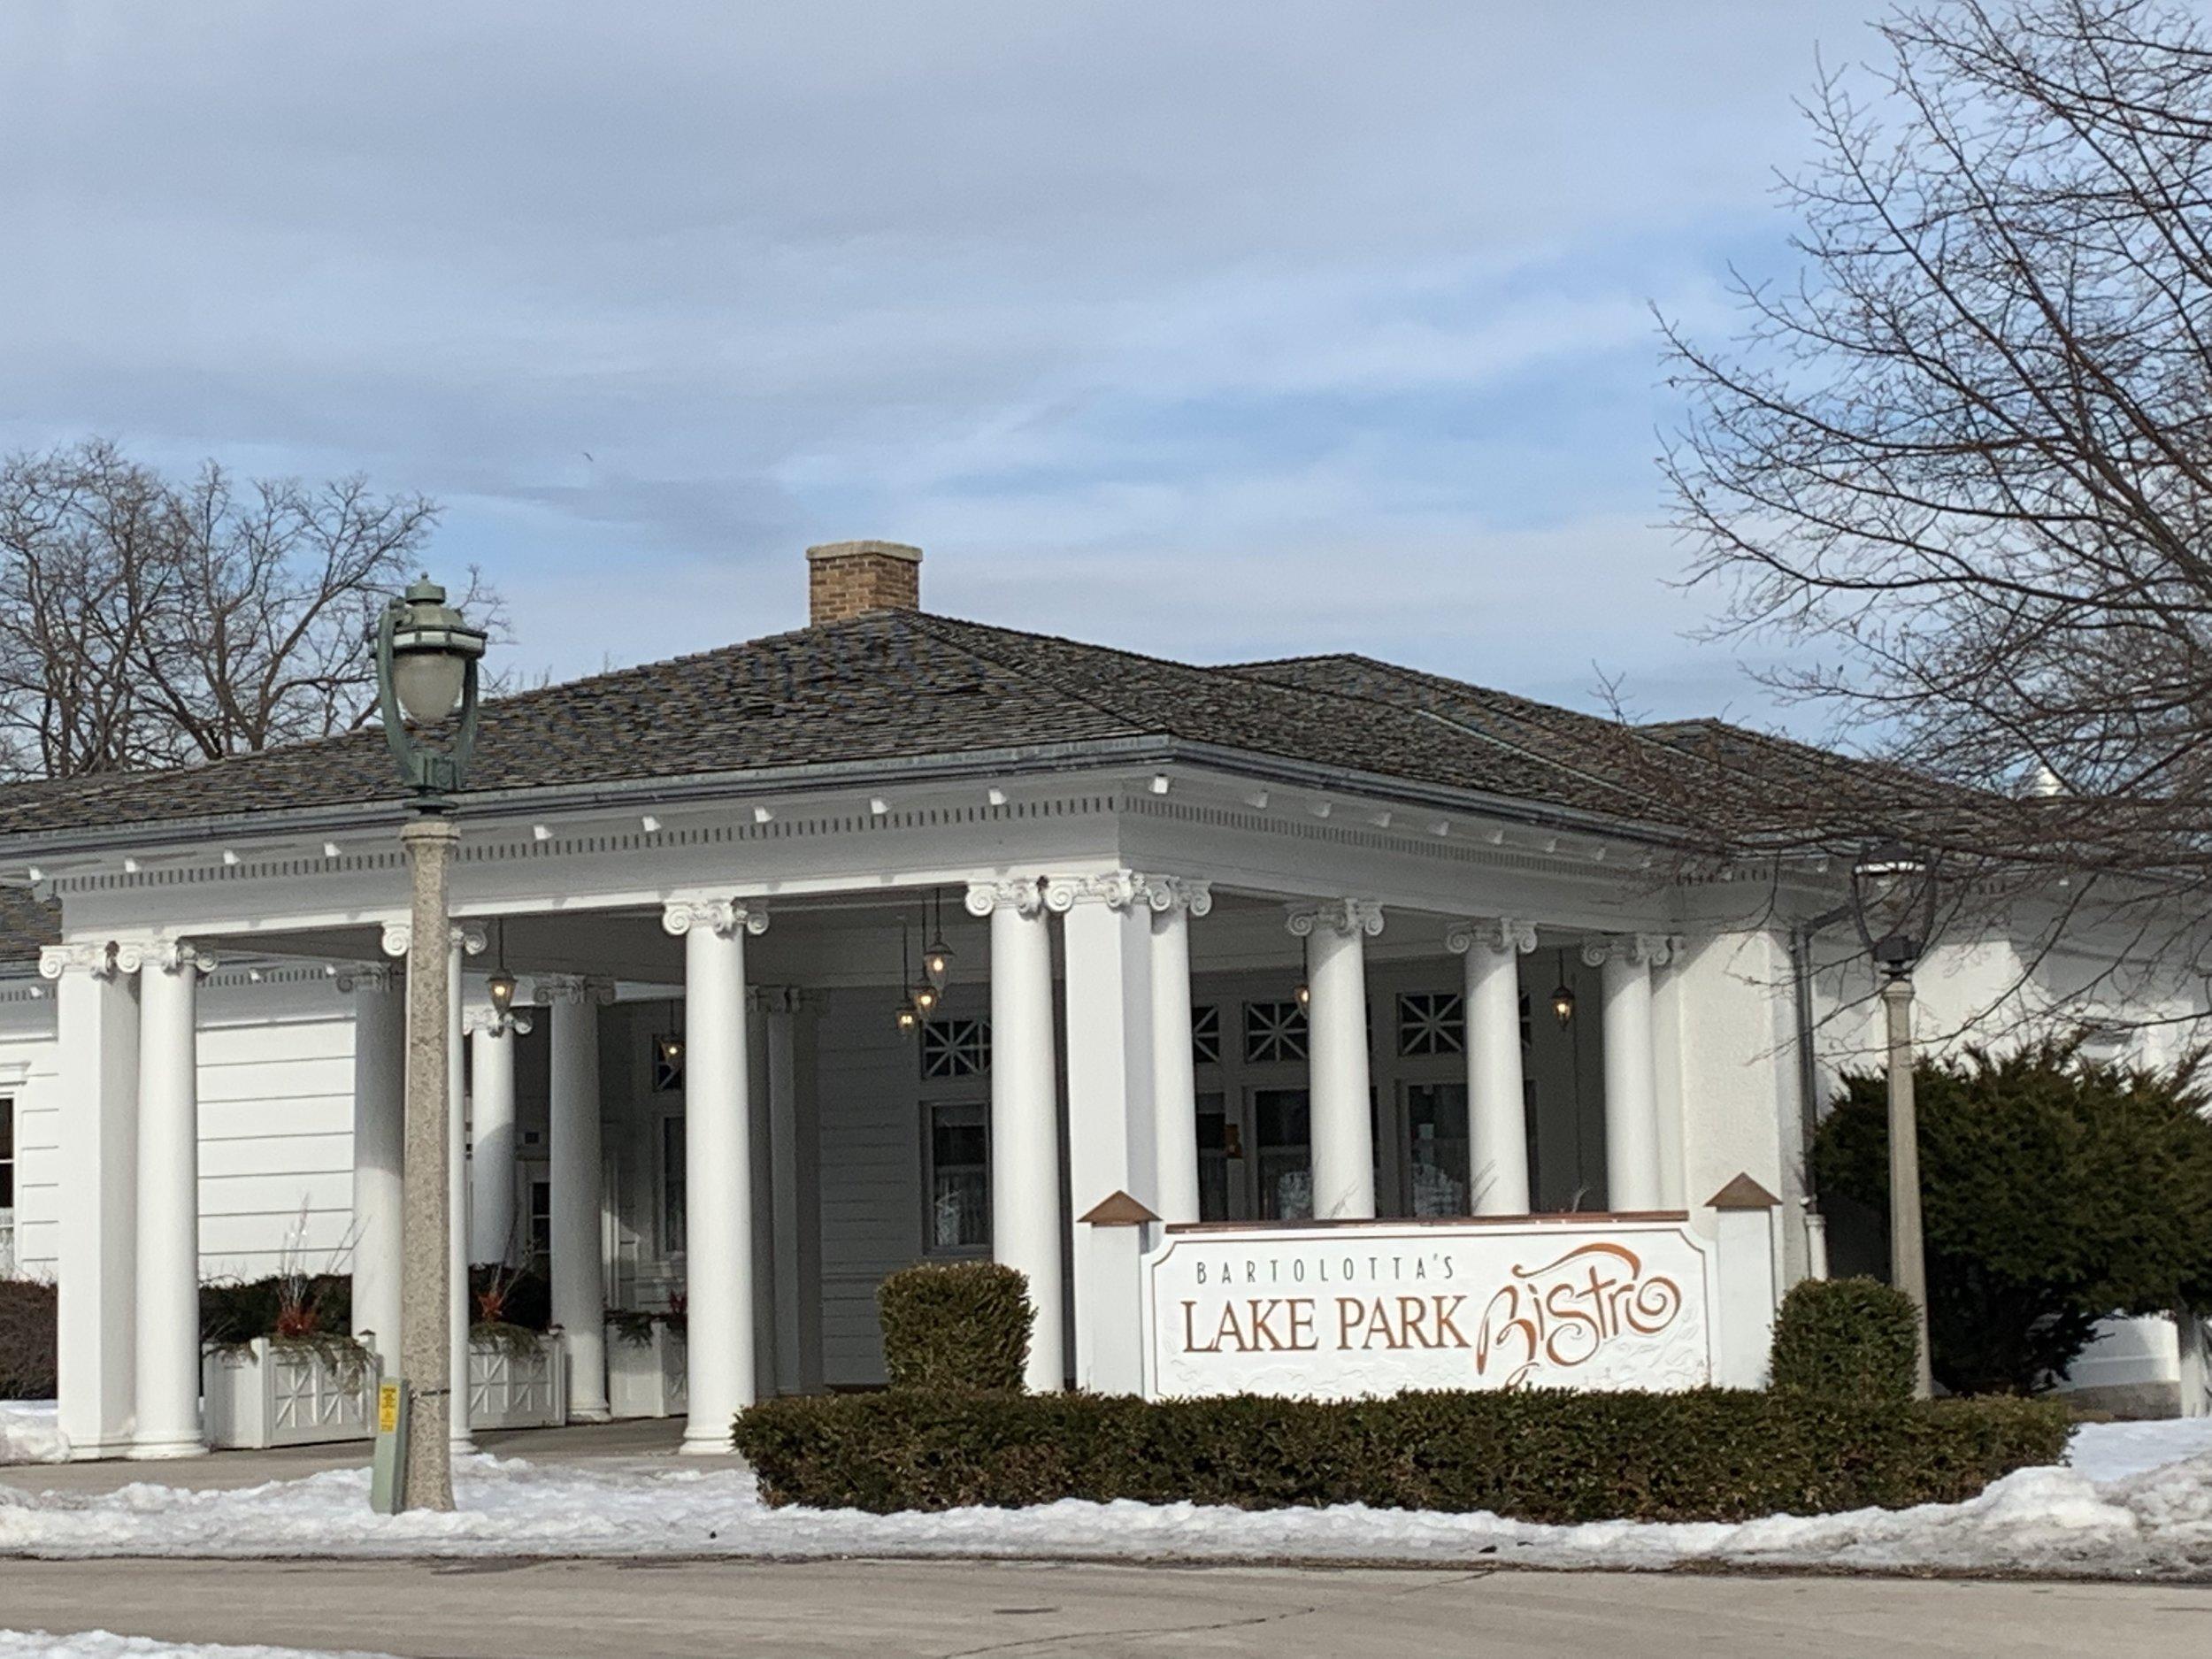 Lake Park Bistro Milwaukee restaurant.jpg